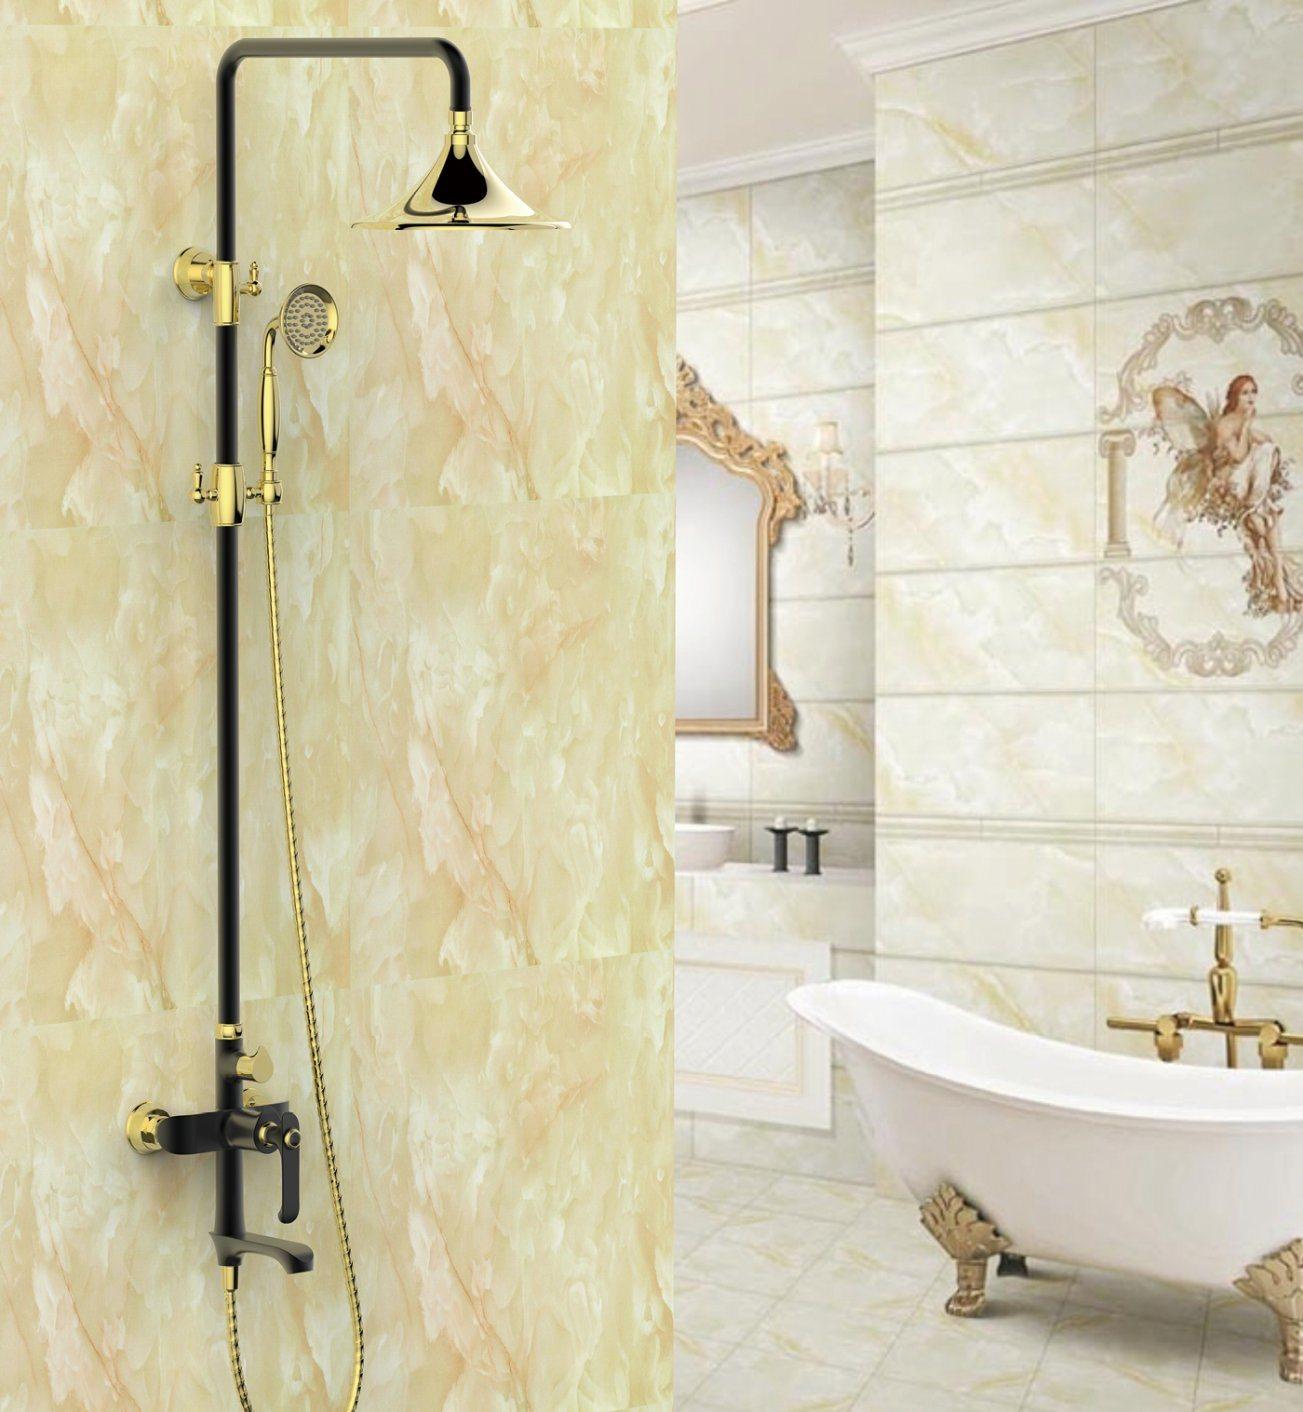 Hot Item New Black Design Ceramic Single Gs3185h Antique Brass Rain Shower Set